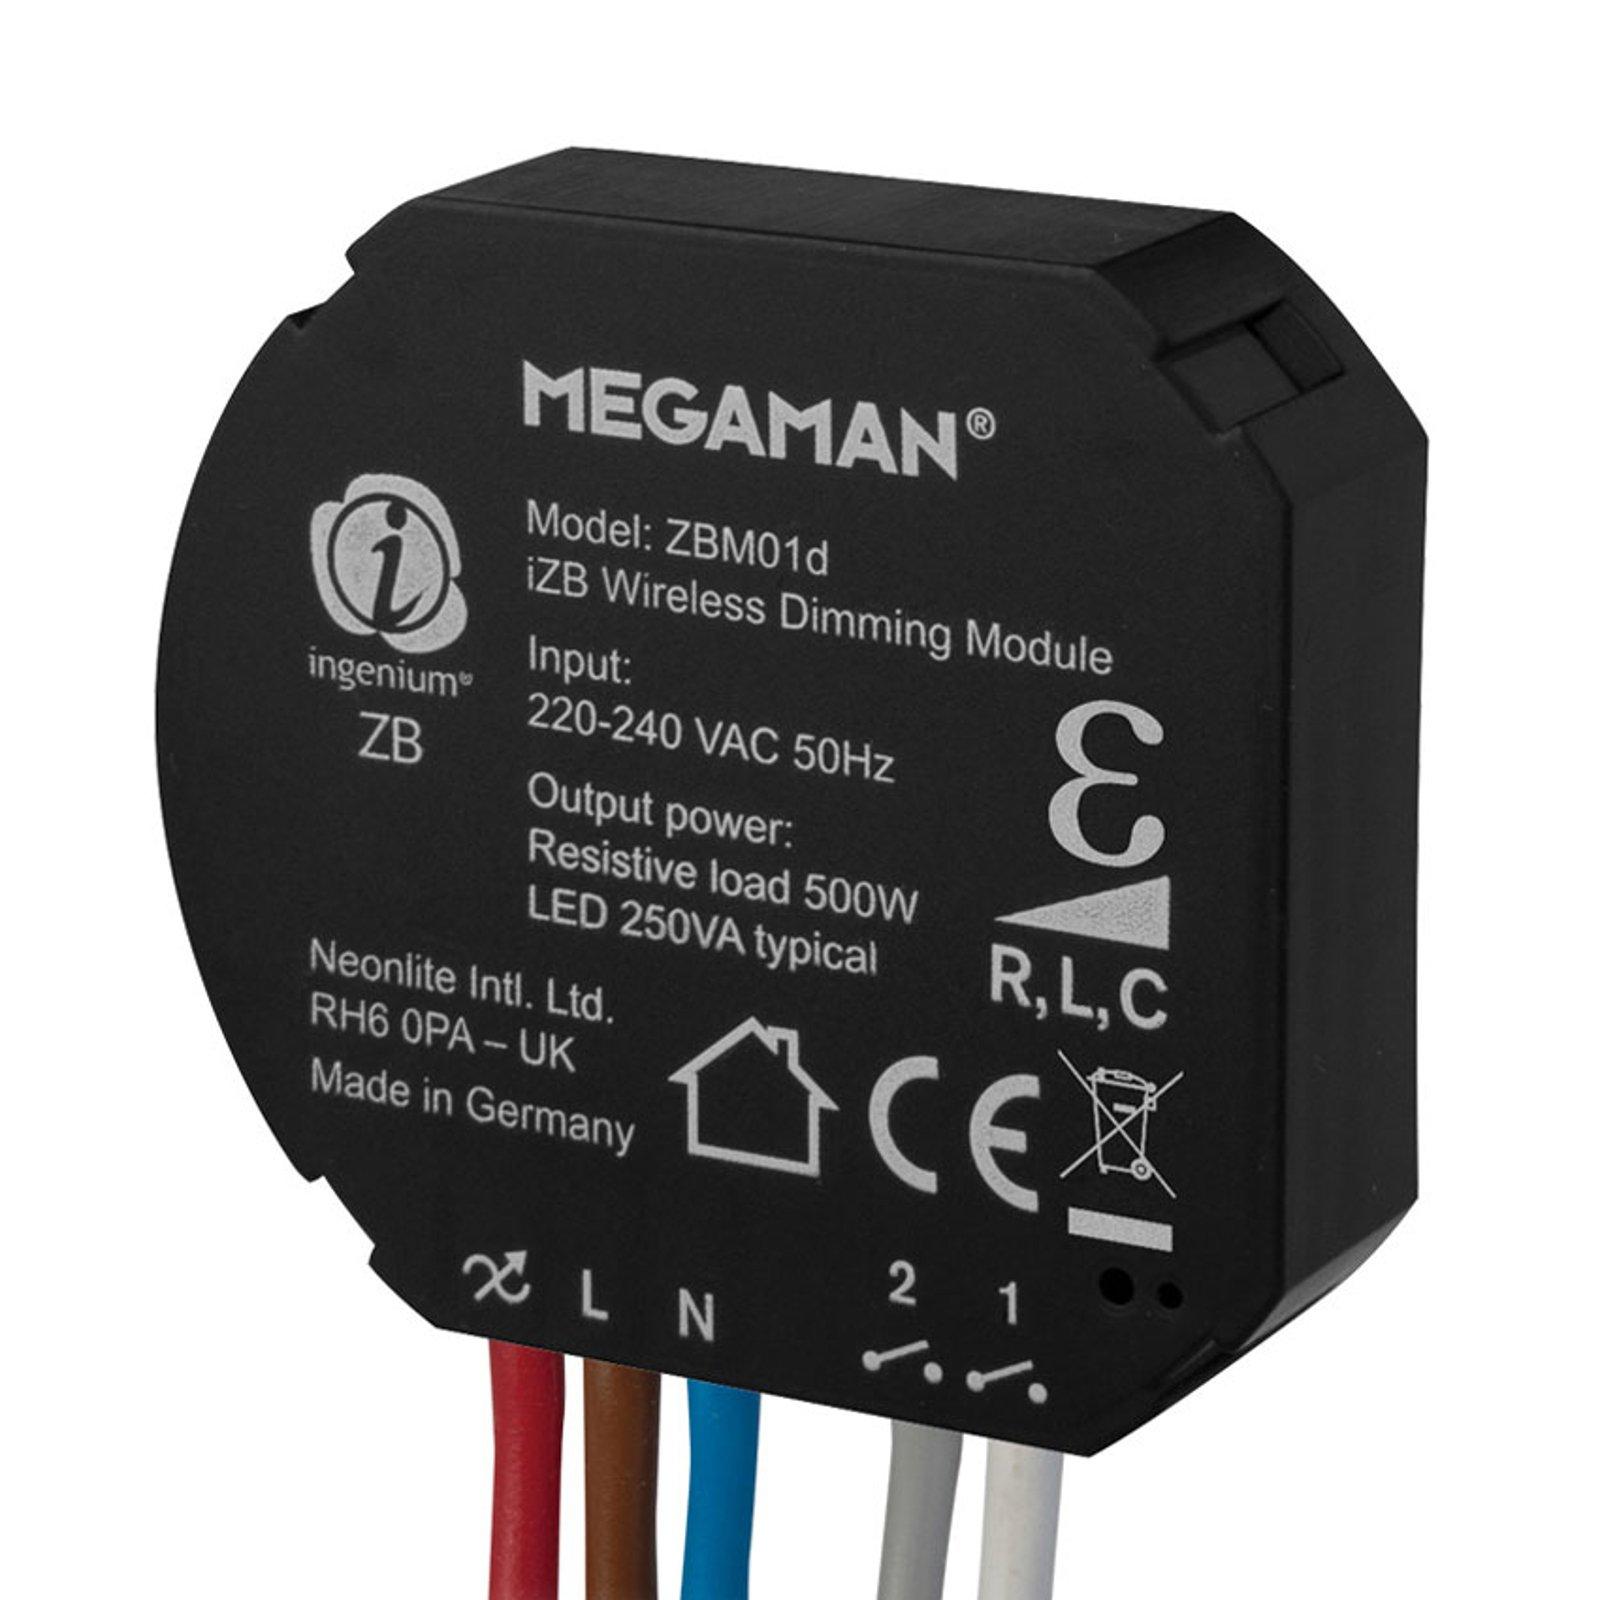 Megaman ingenium®ZB dimme-modul 250W, R,L,C